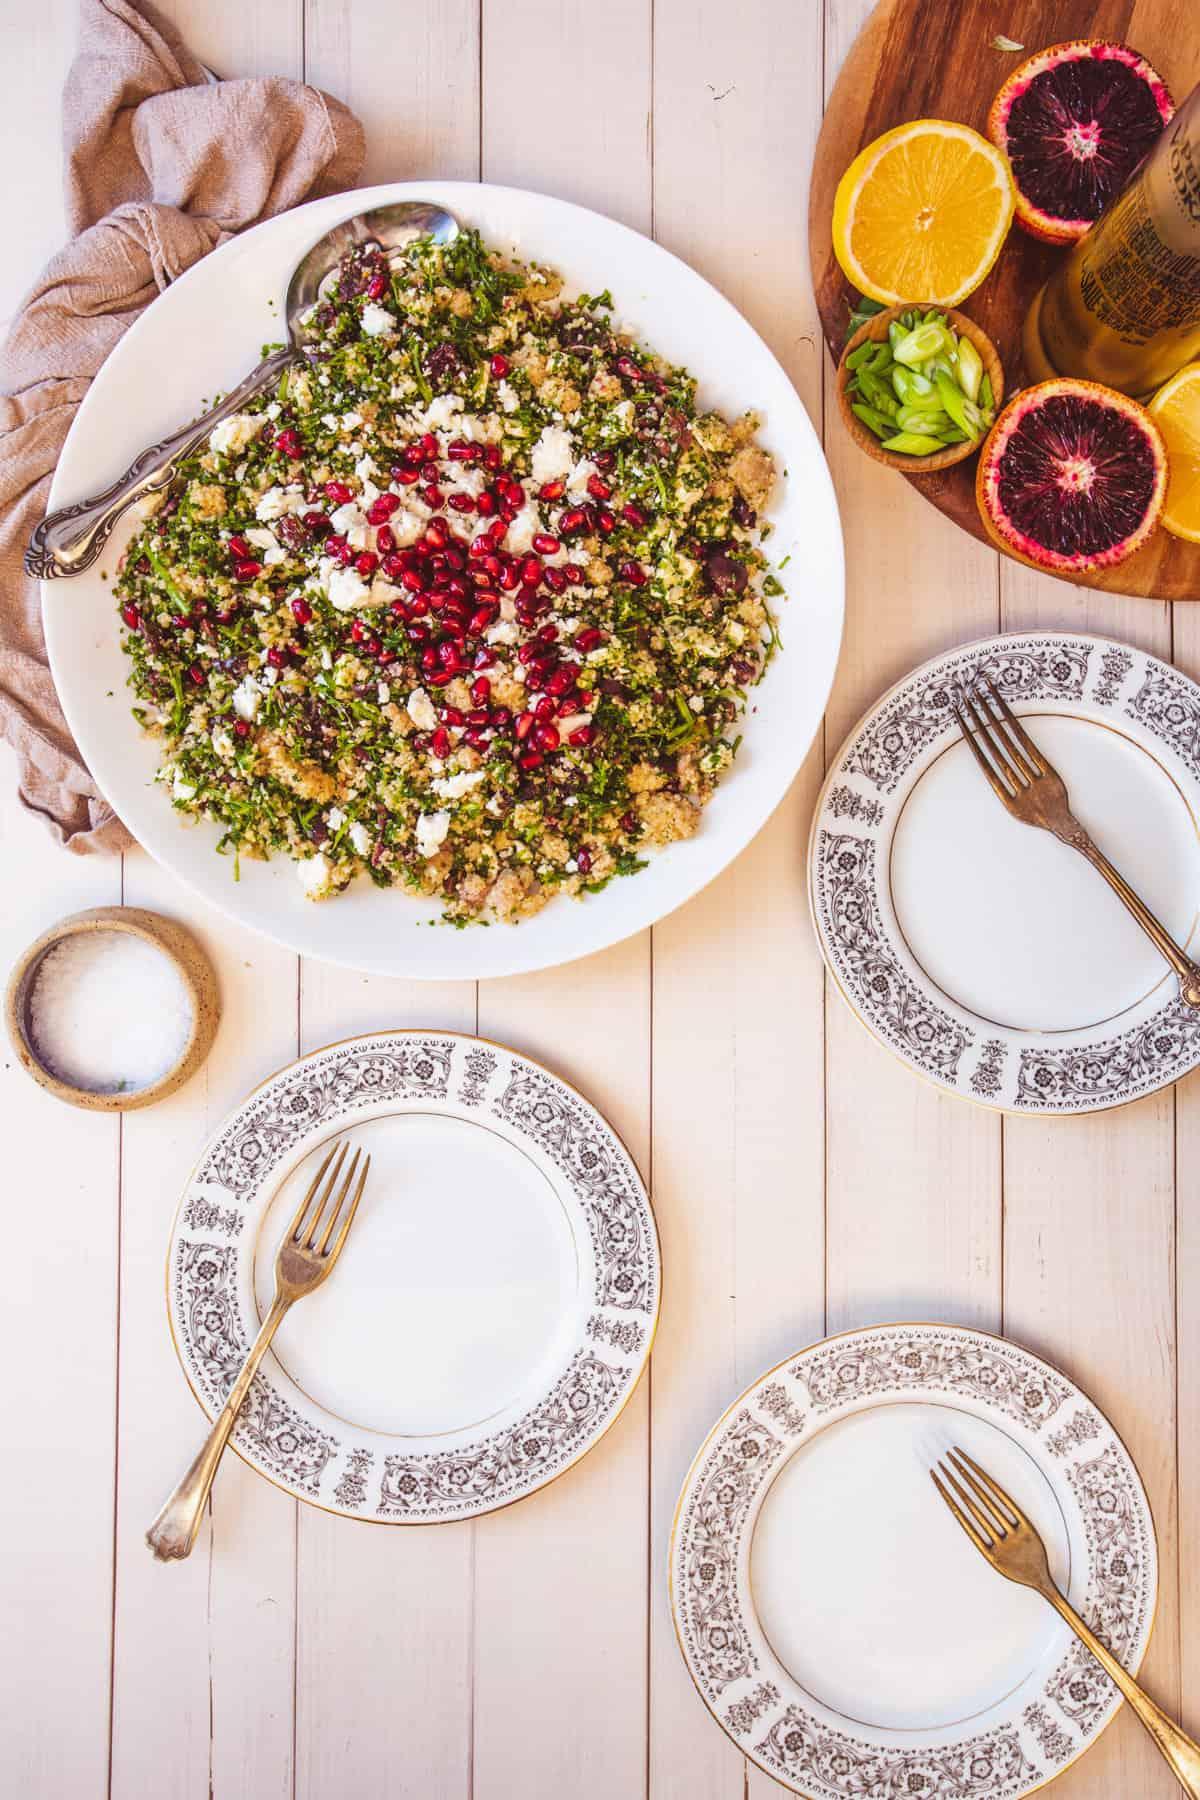 bulgur salad with three plates